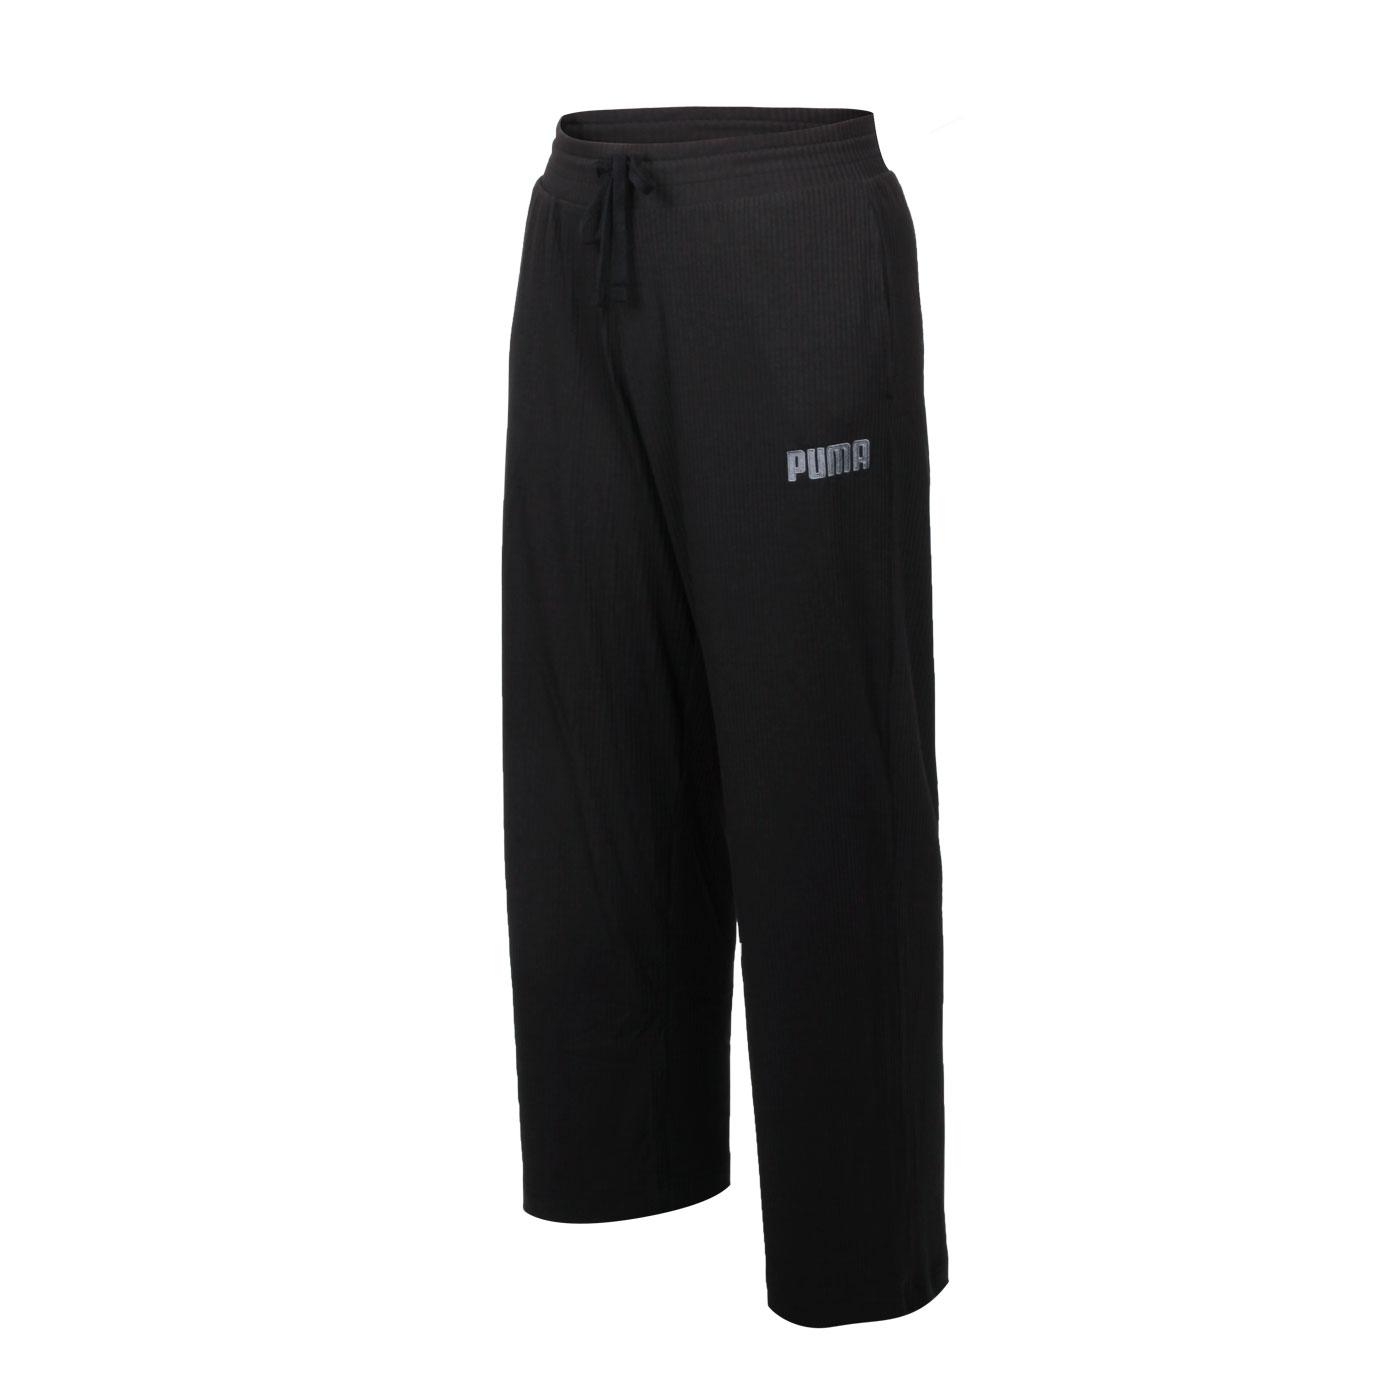 PUMA 女款基本系列Modern Basics羅紋寬褲 58593801 - 黑灰